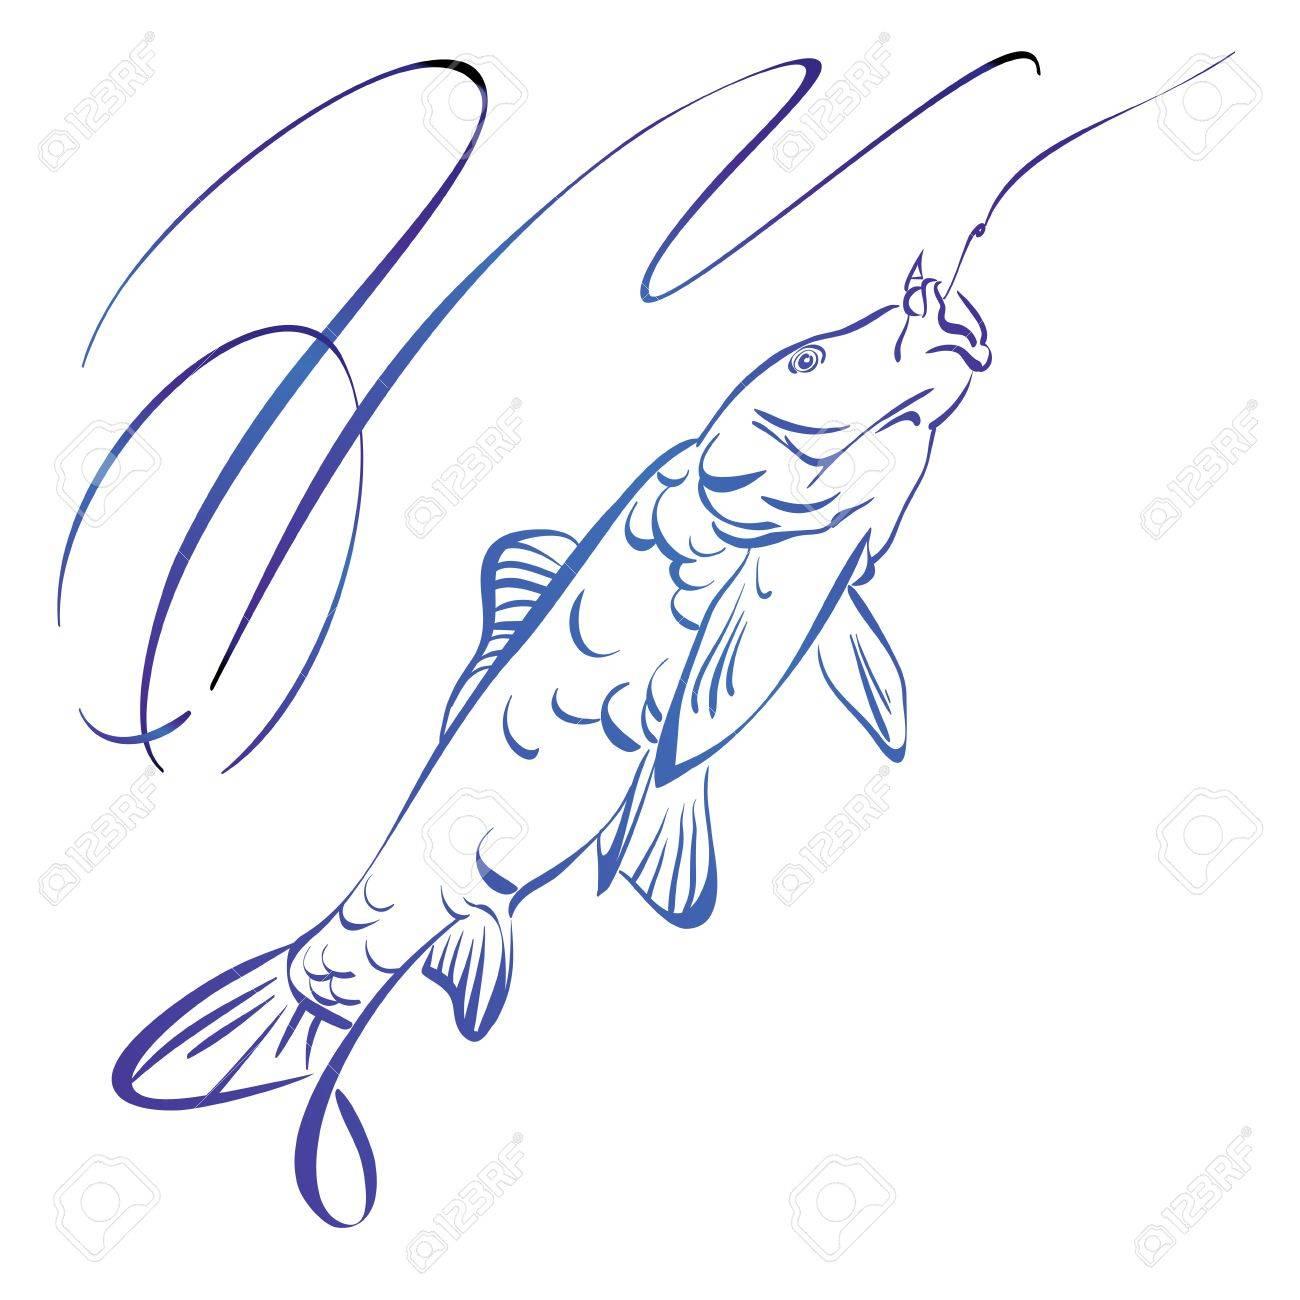 Fish symbol, hand drawn vector llustration realistic sketch Stock Vector - 23075922